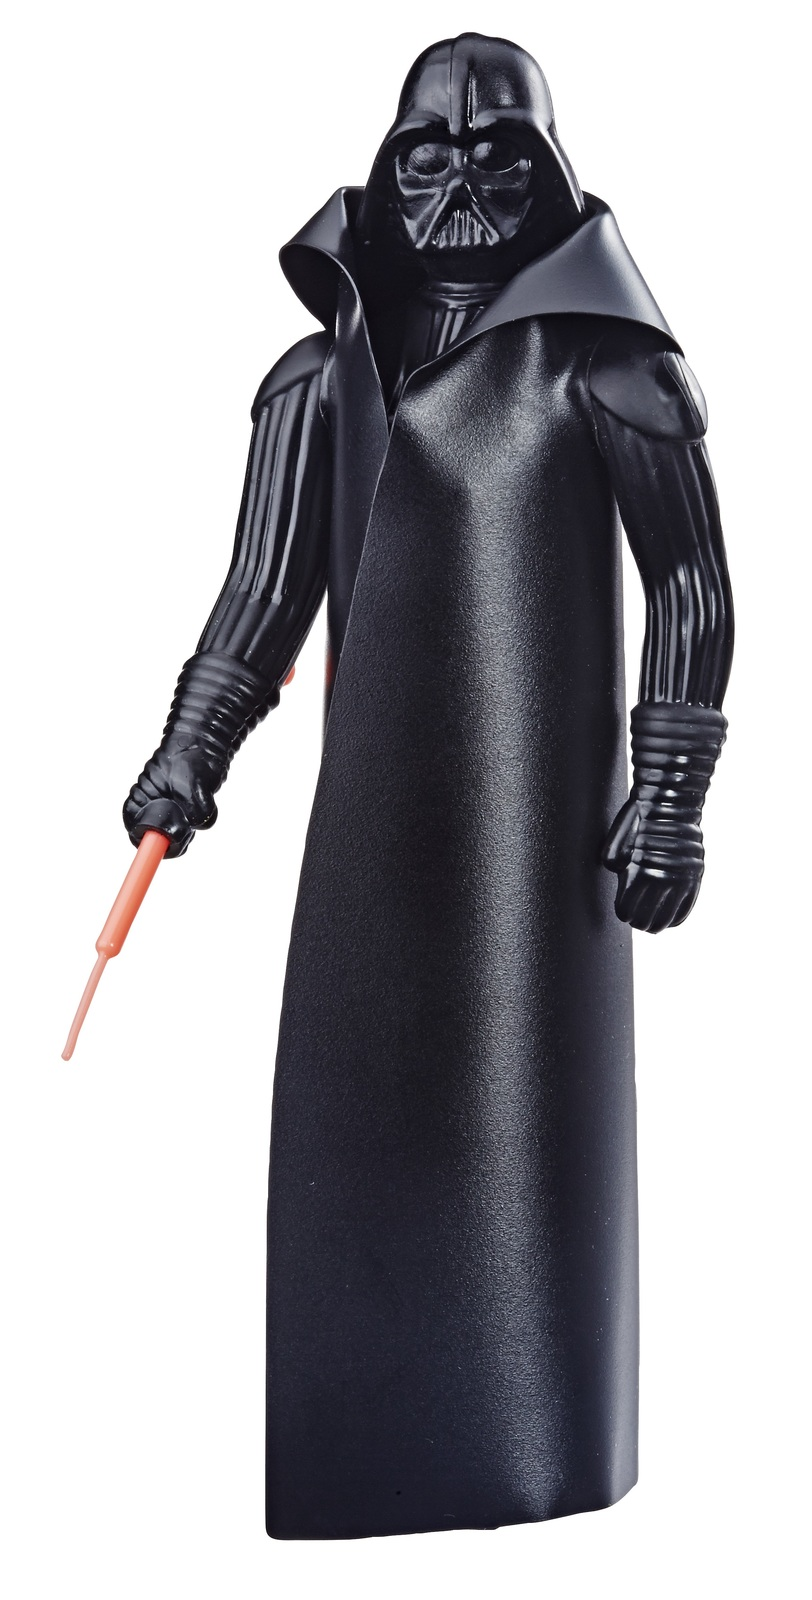 "Darth Vader - 3.75"" Action Figure image"